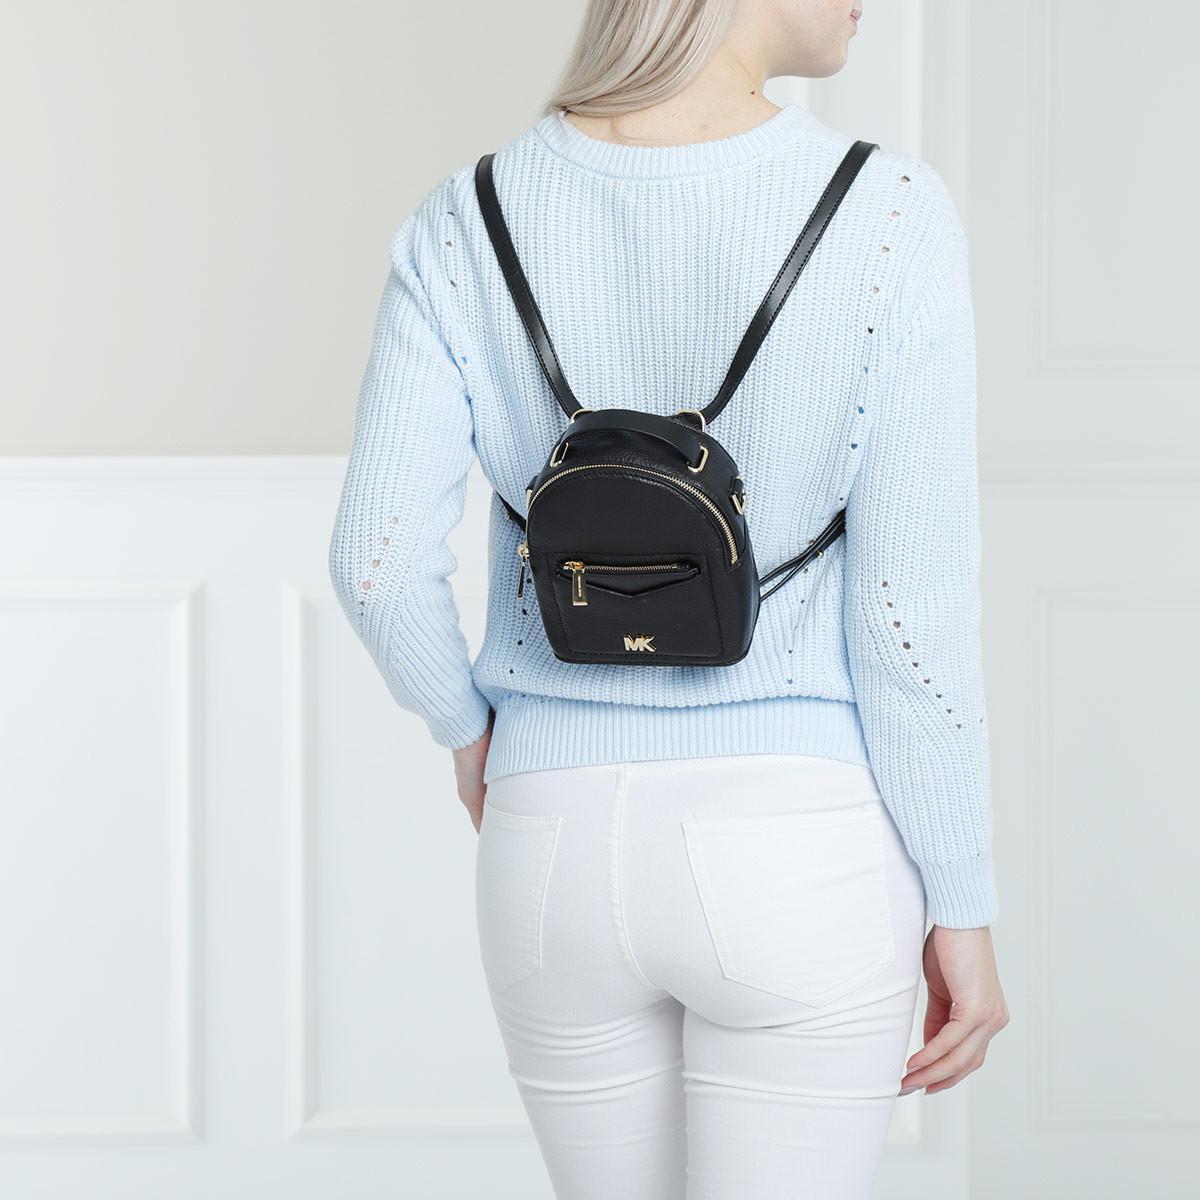 70100ee35eeecd Michael Kors Jessa Xs Convertible Backpack Black in Black - Lyst